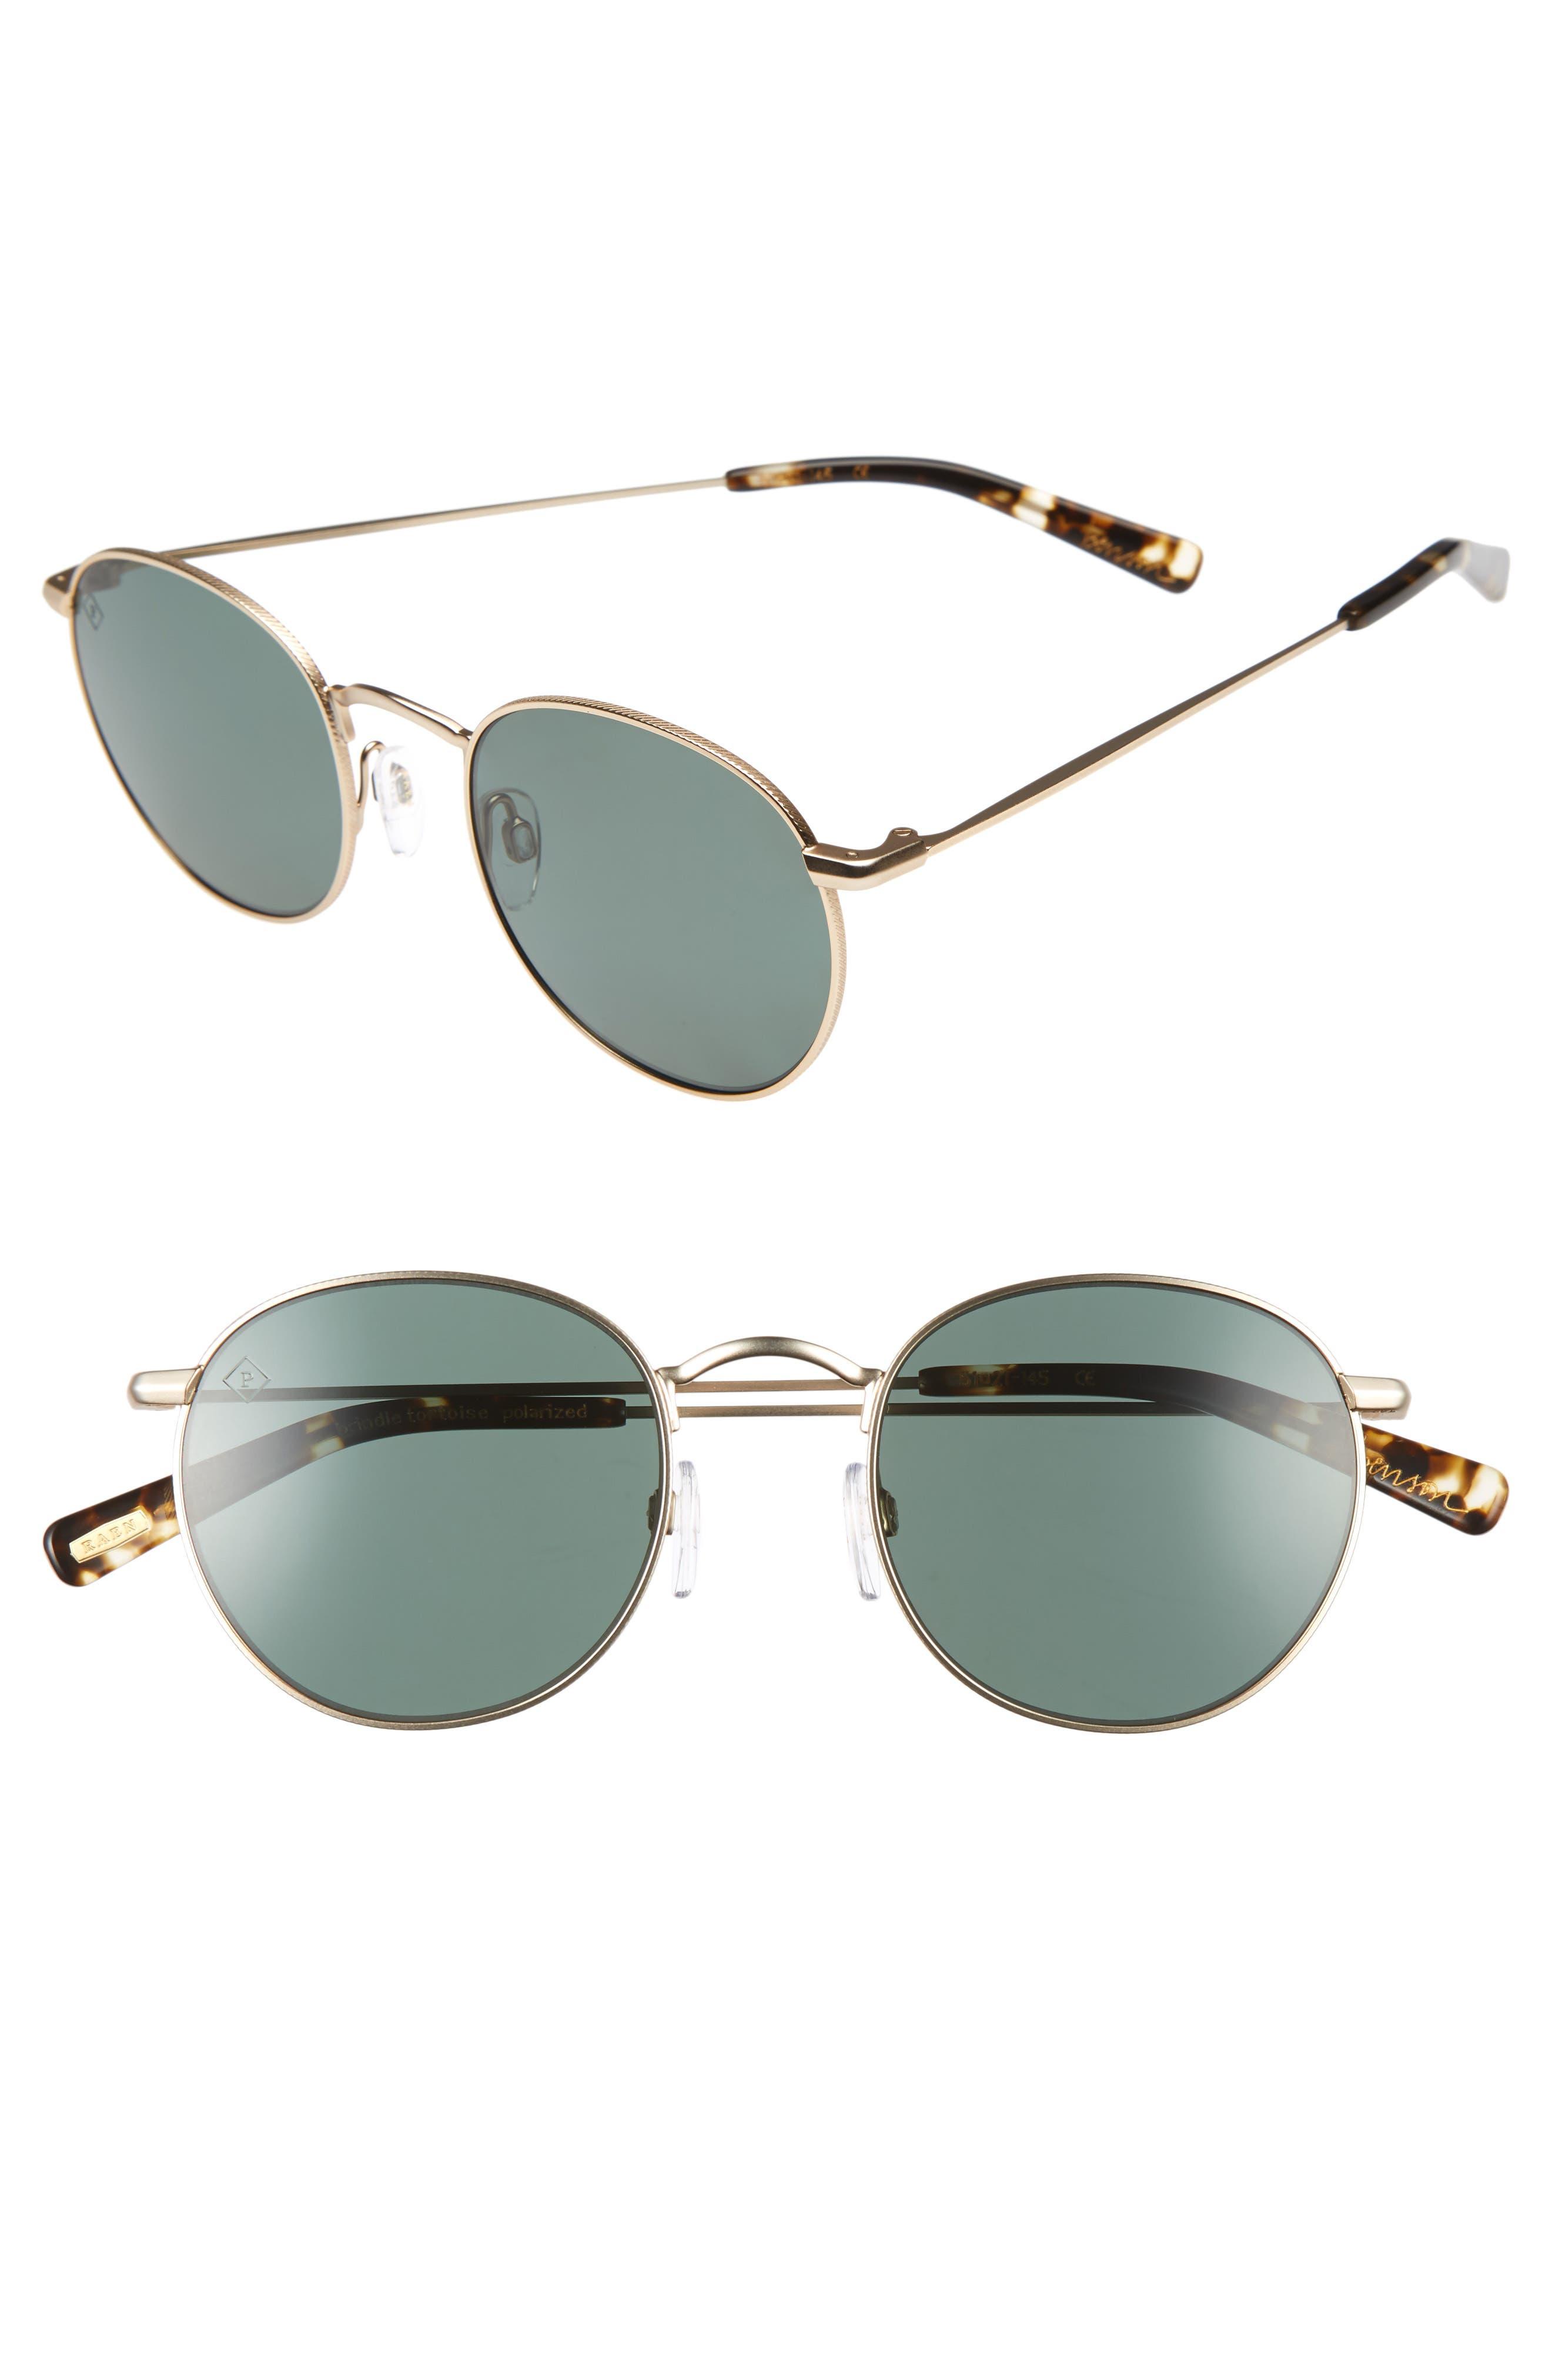 Benson 51mm Polarized Sunglasses,                         Main,                         color, 710